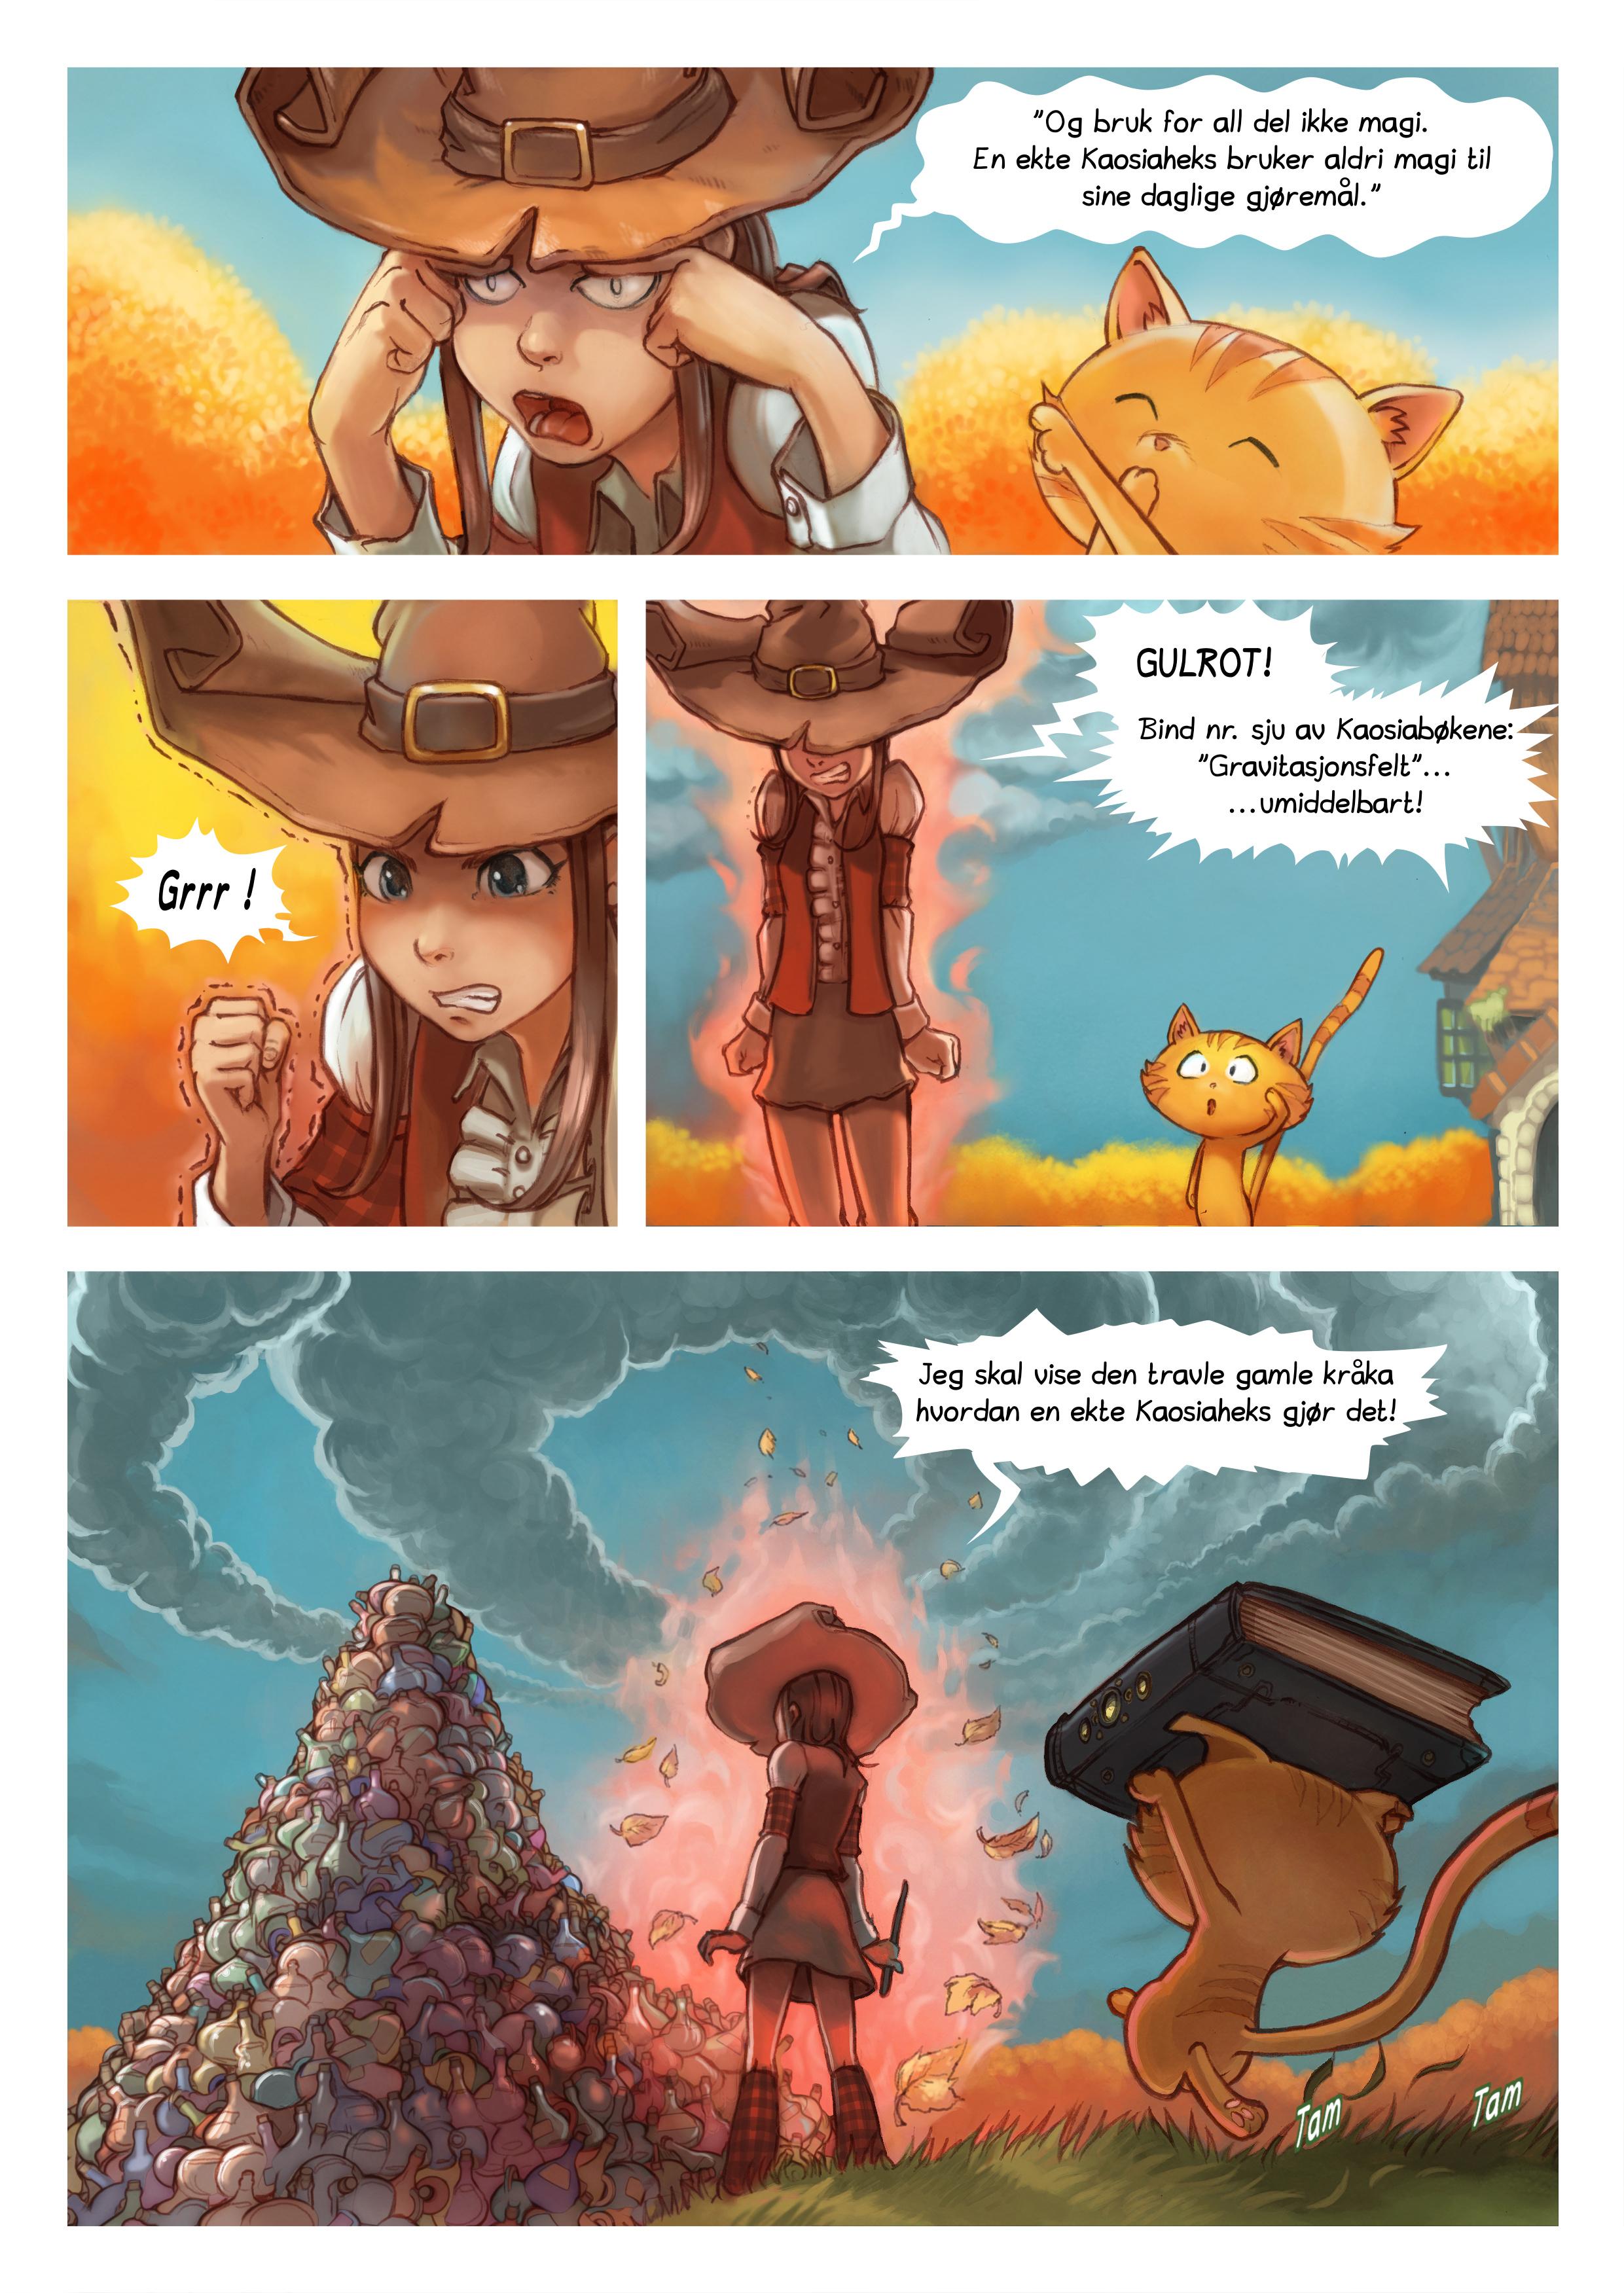 Episode 12: Høstrengjøring, Page 3